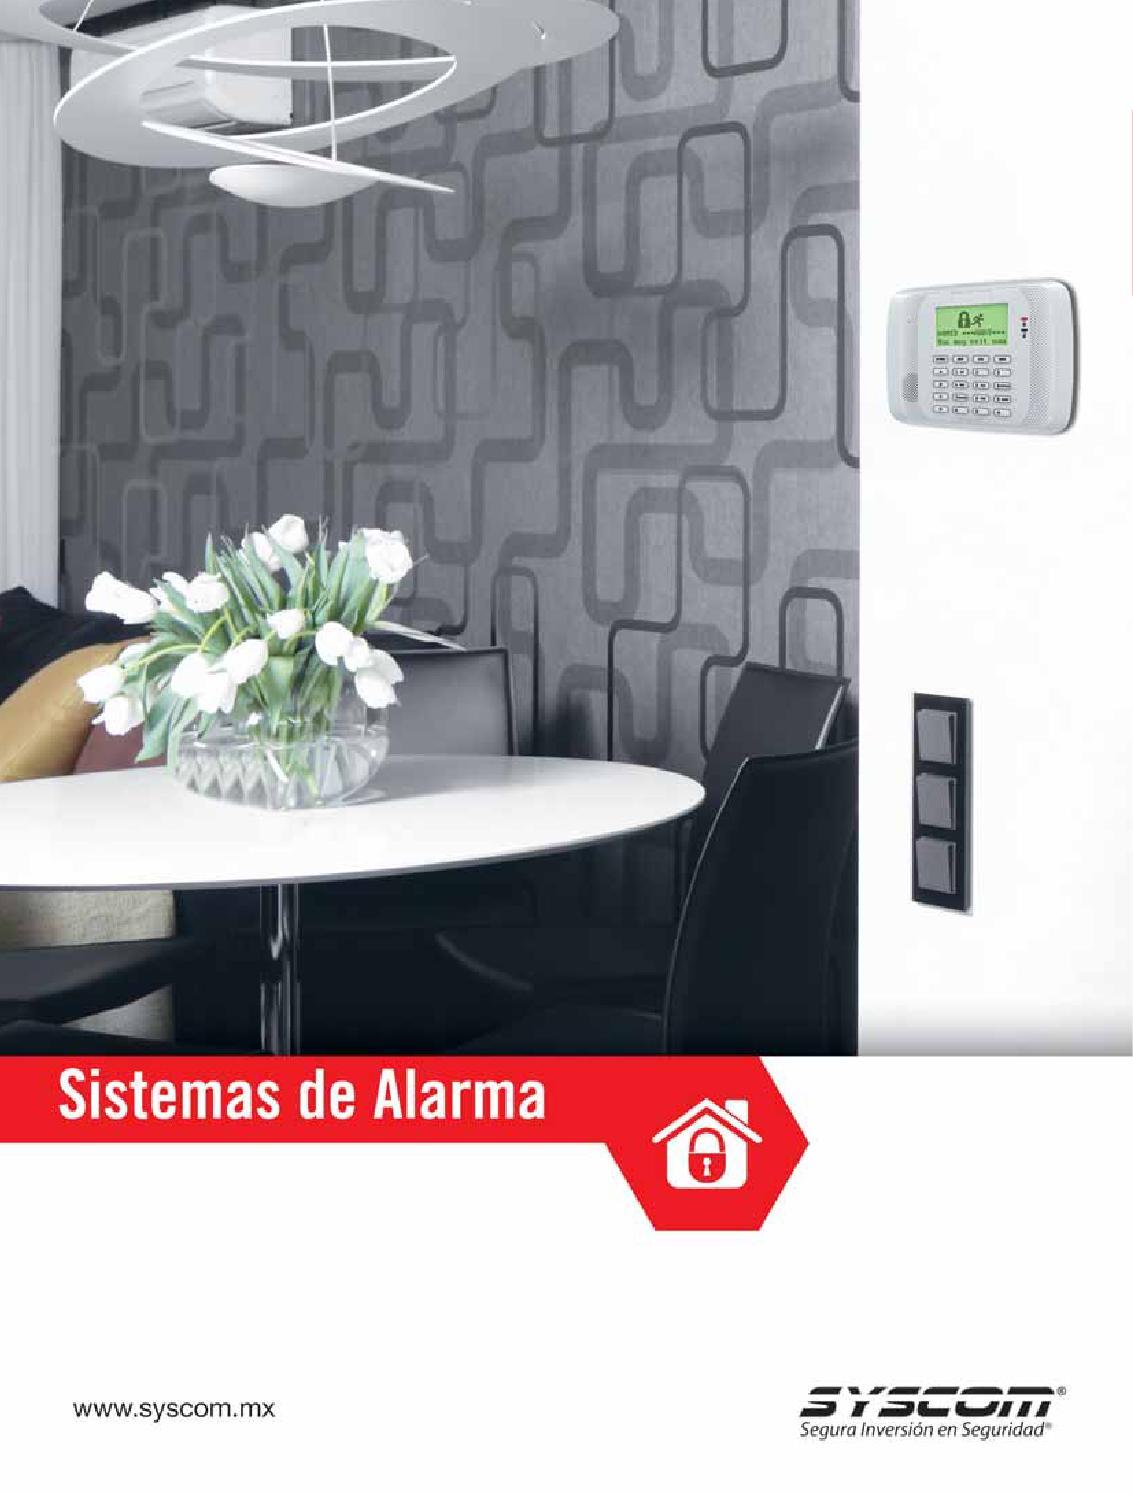 Sistemas de alarmas electr nicas by cjp telecom issuu - Sistemas de alarma ...